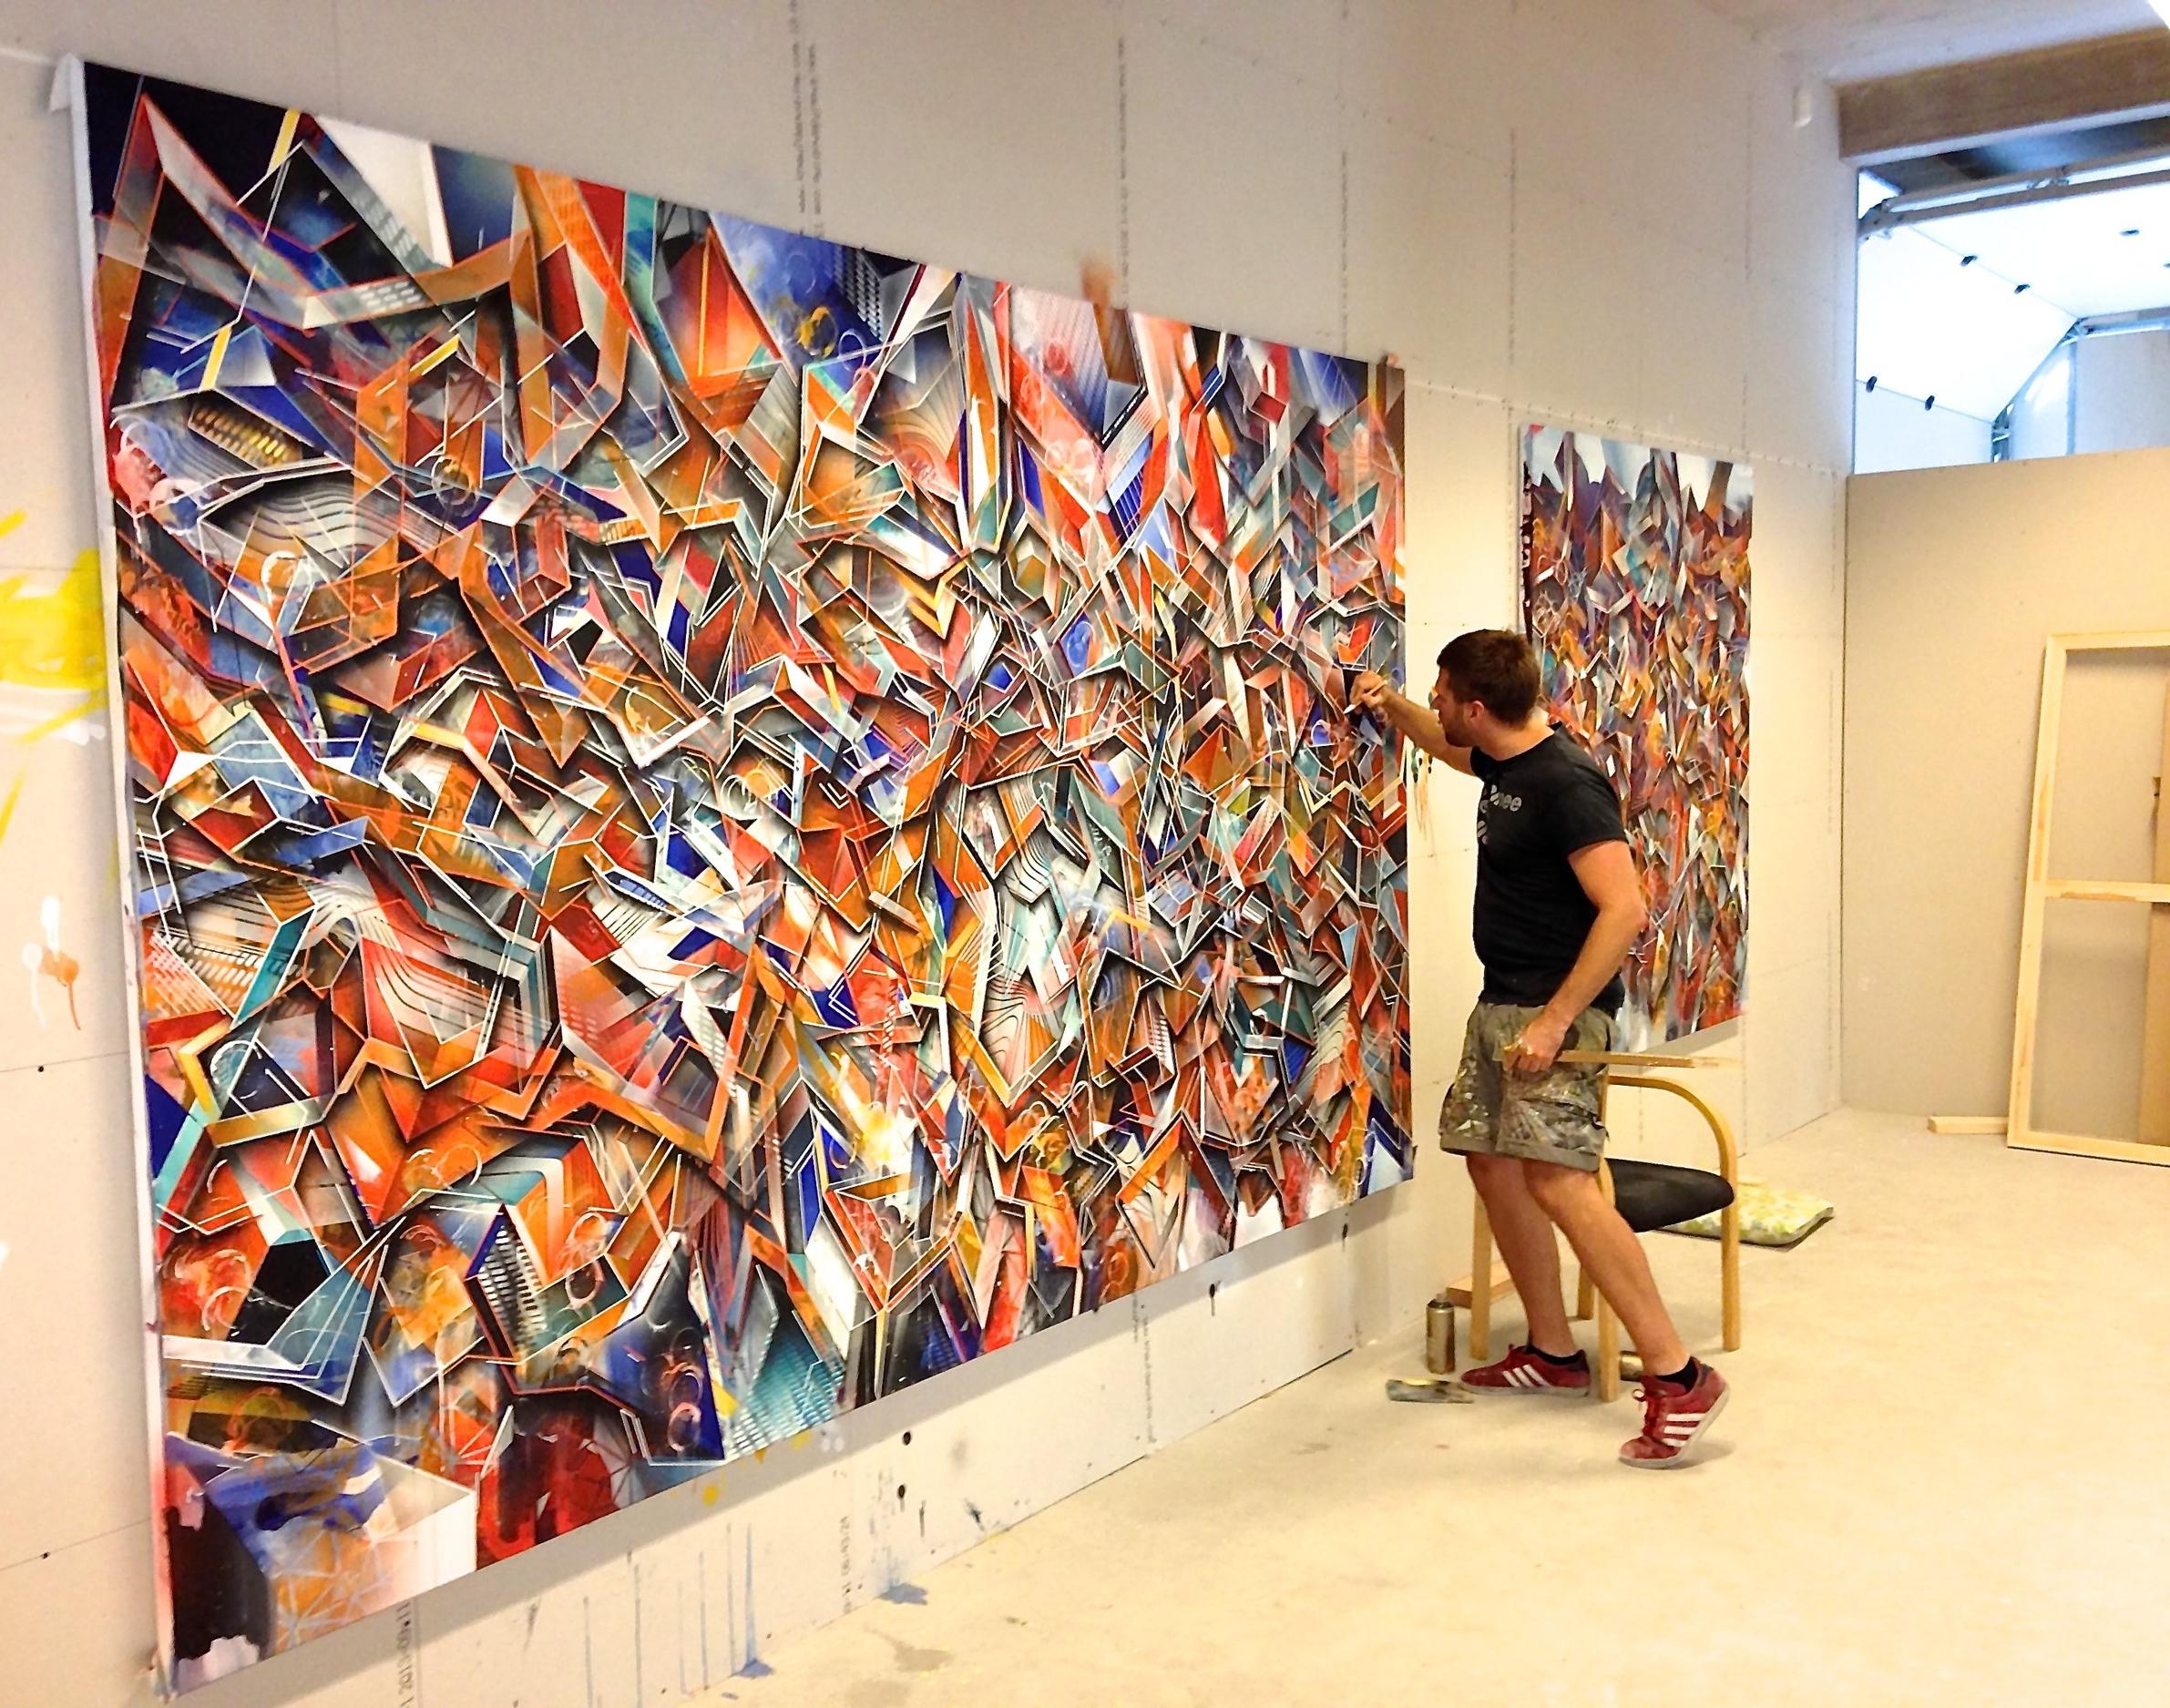 Creating the Neural Handshake 202 x 332 cm painting